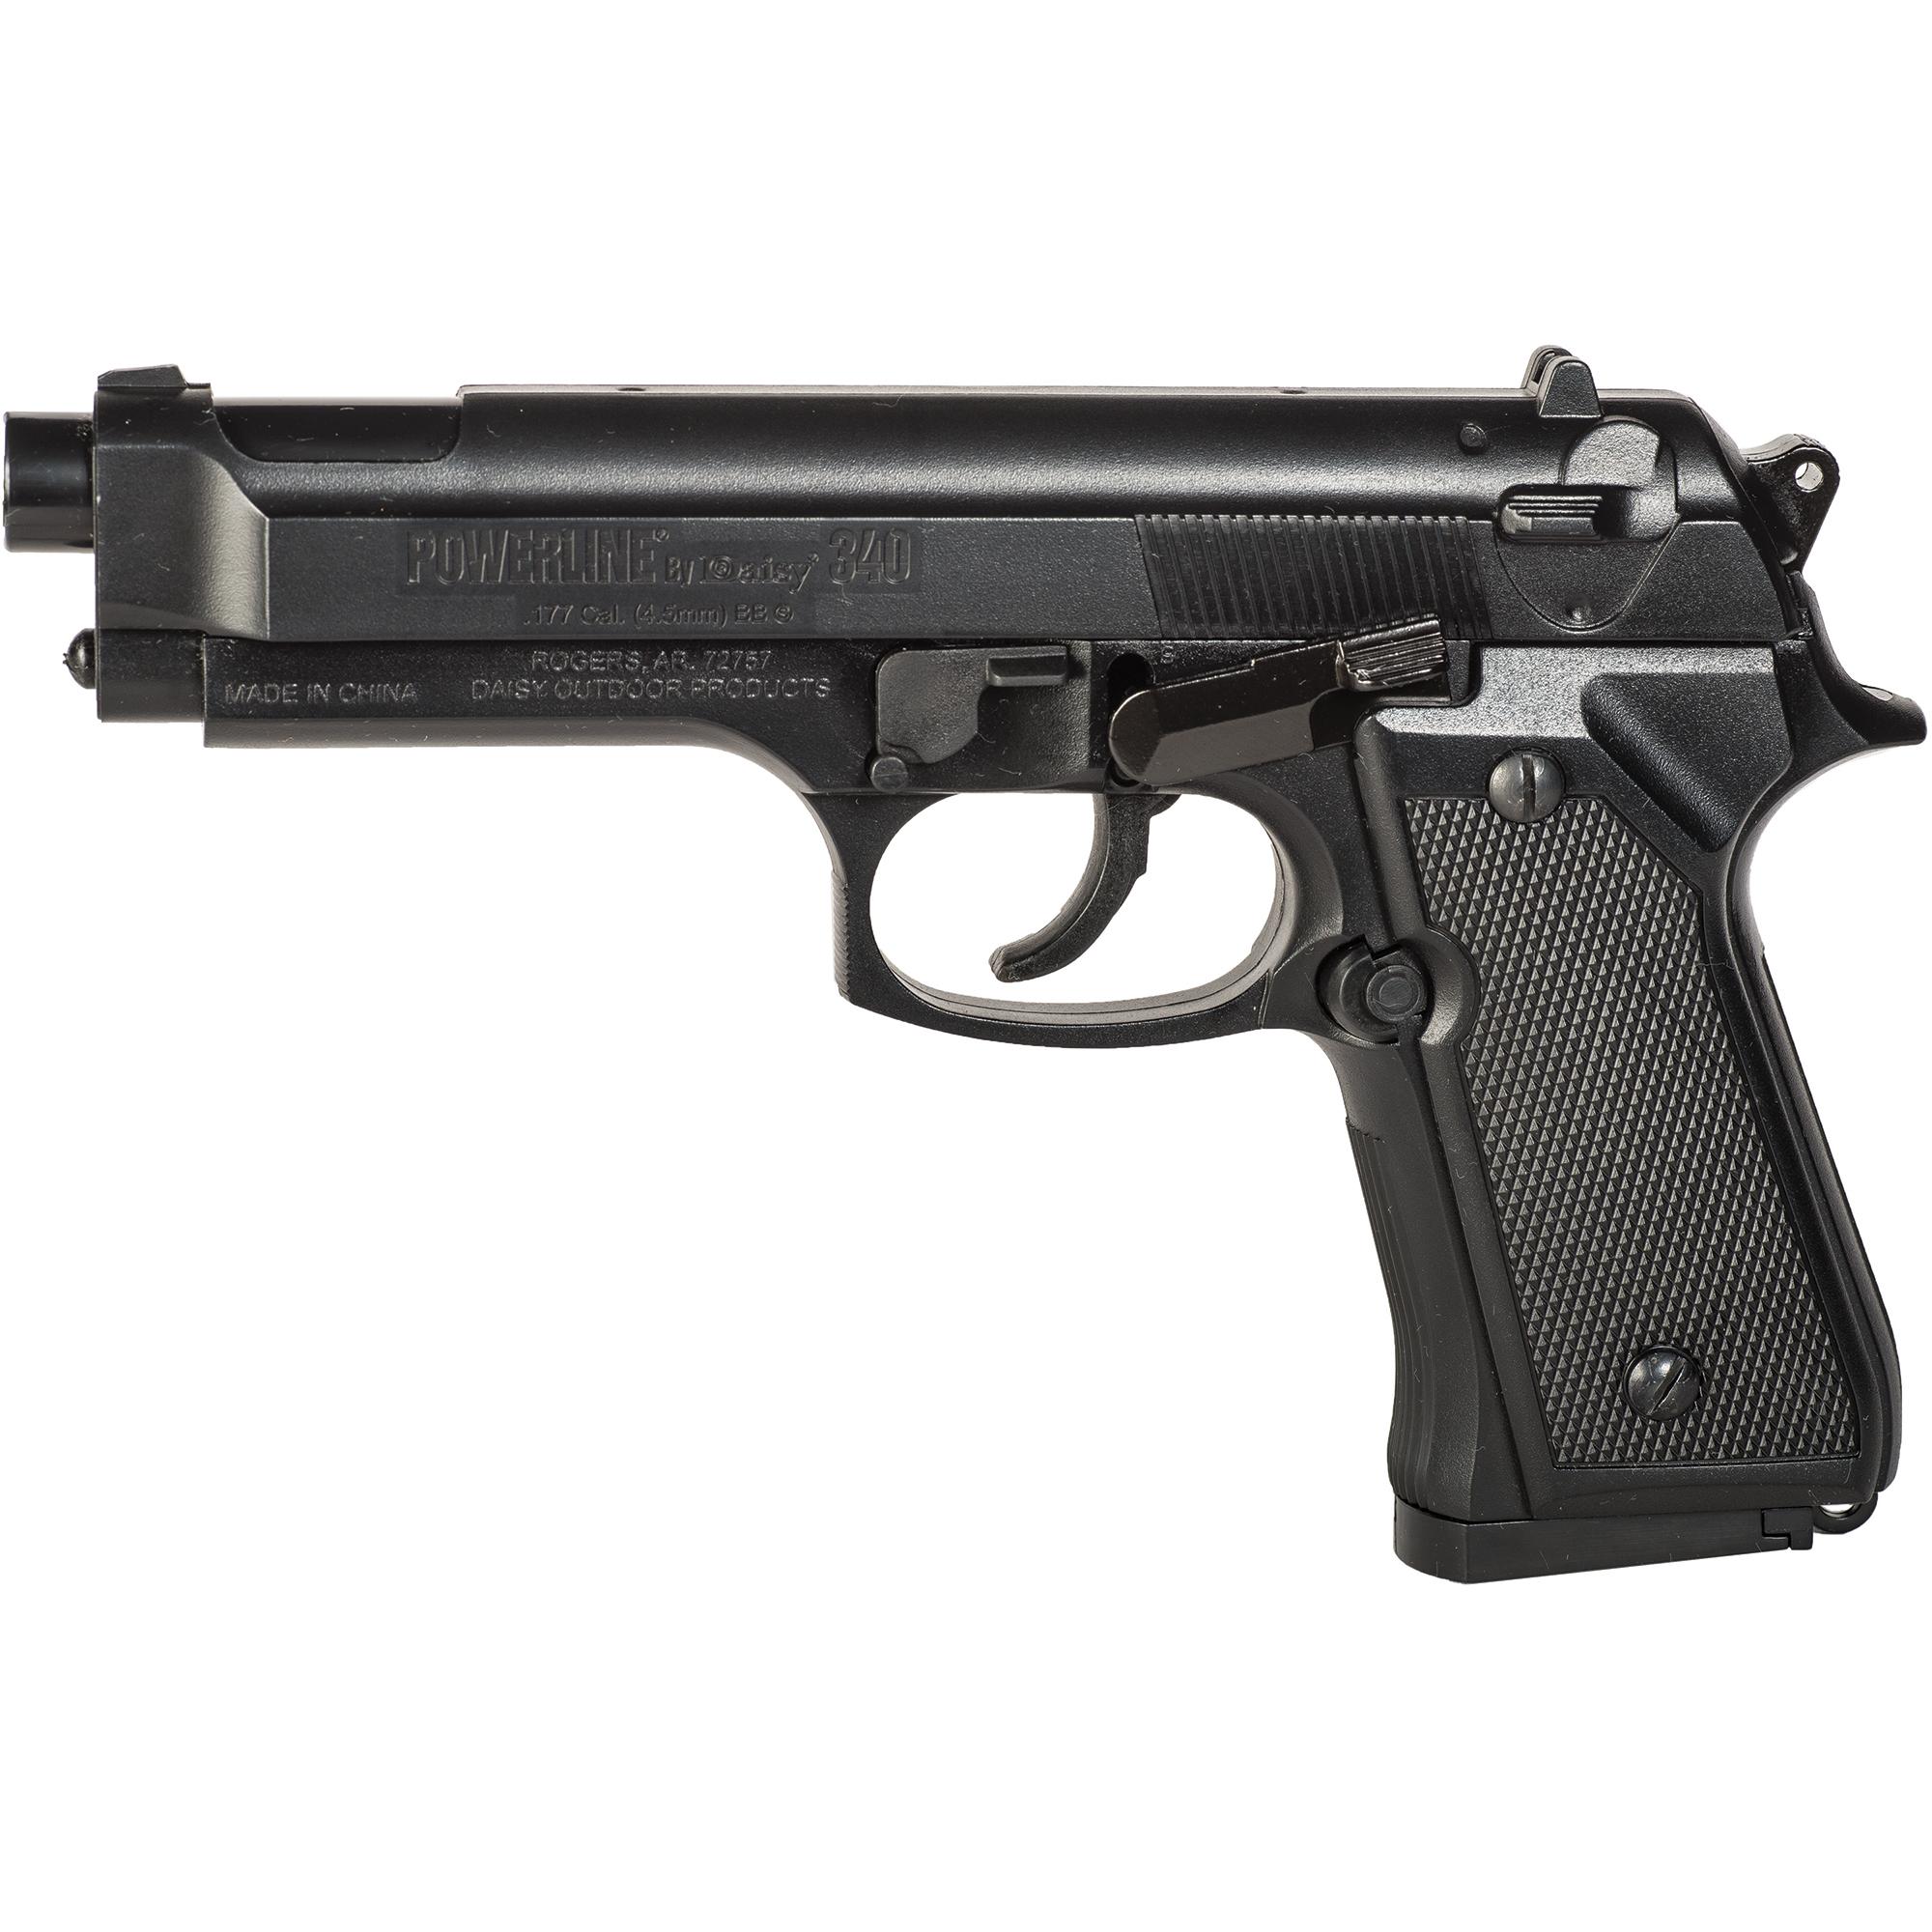 Daisy Powerline Model 340 Air Pistol